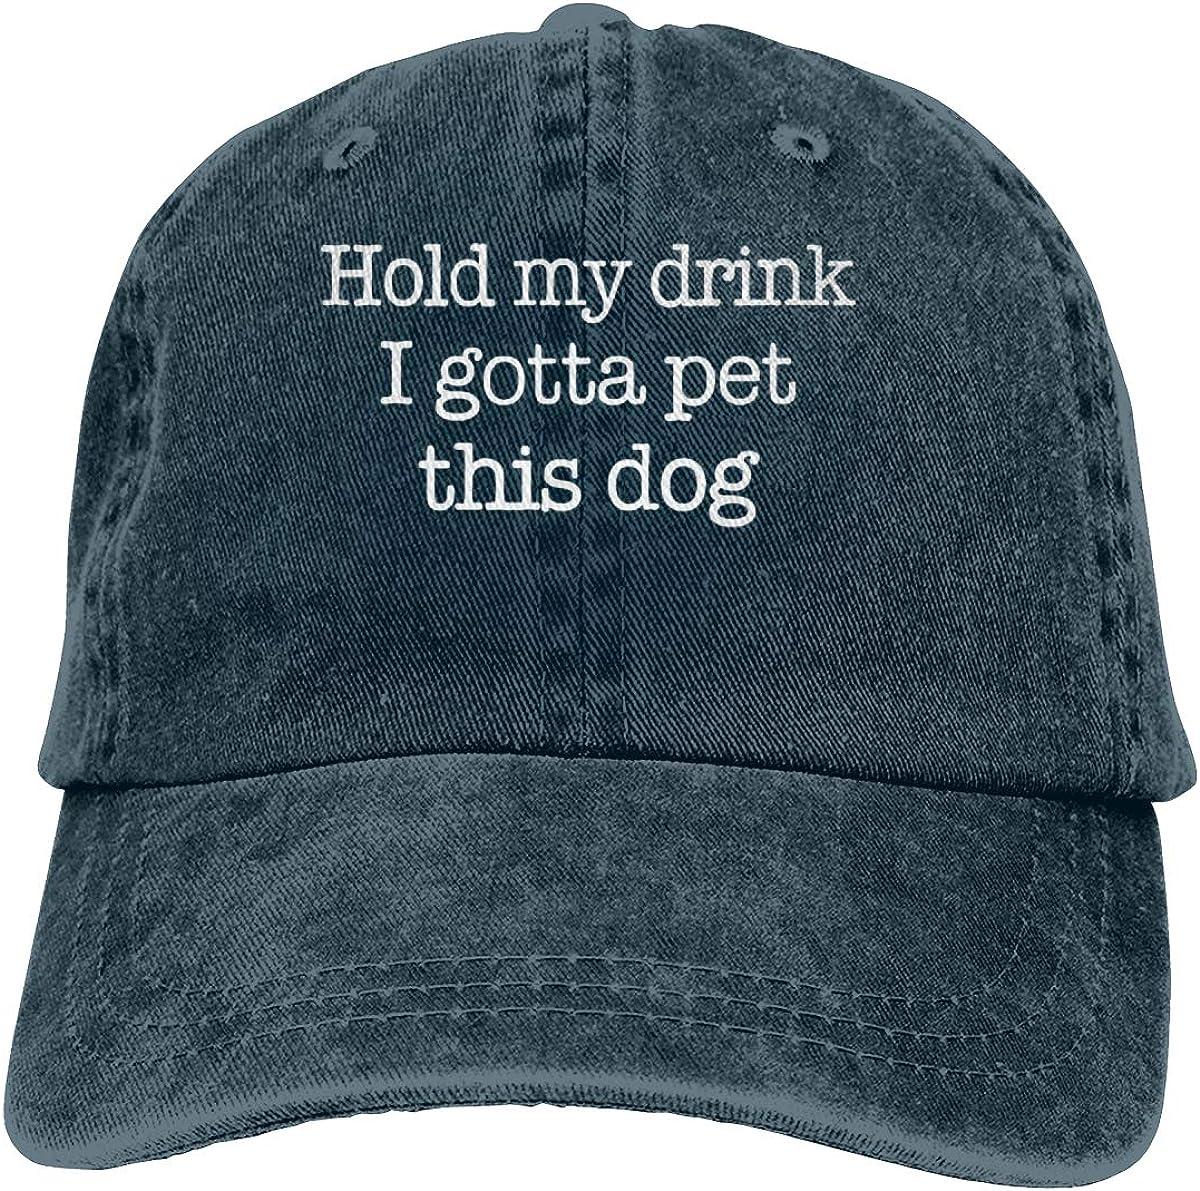 Hold My Drink I Gotta Pet This Dog Cowboy Caps Unisex Dad Baseball Hat Navy